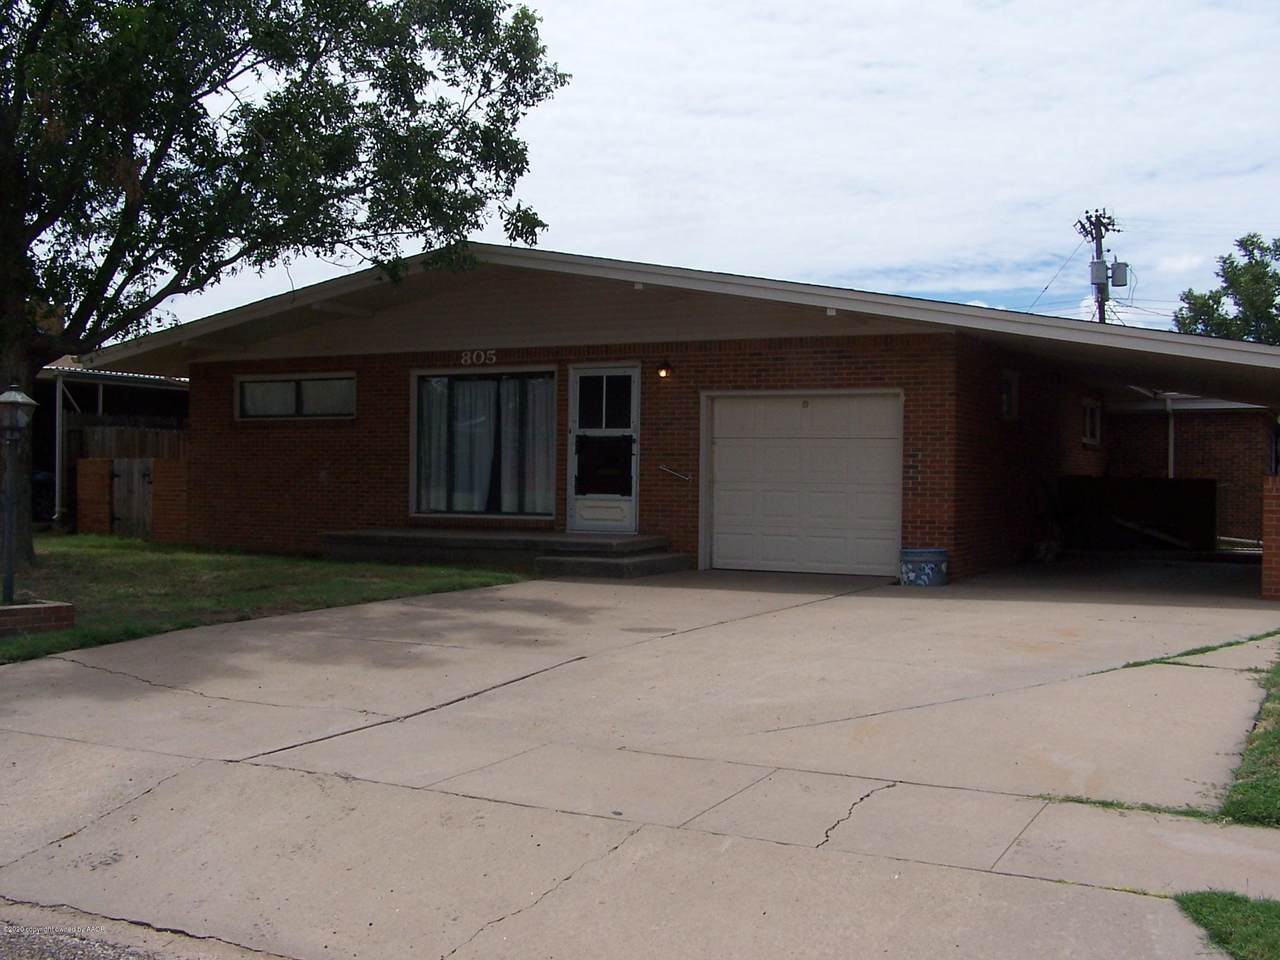 805 Home Rd - Photo 1